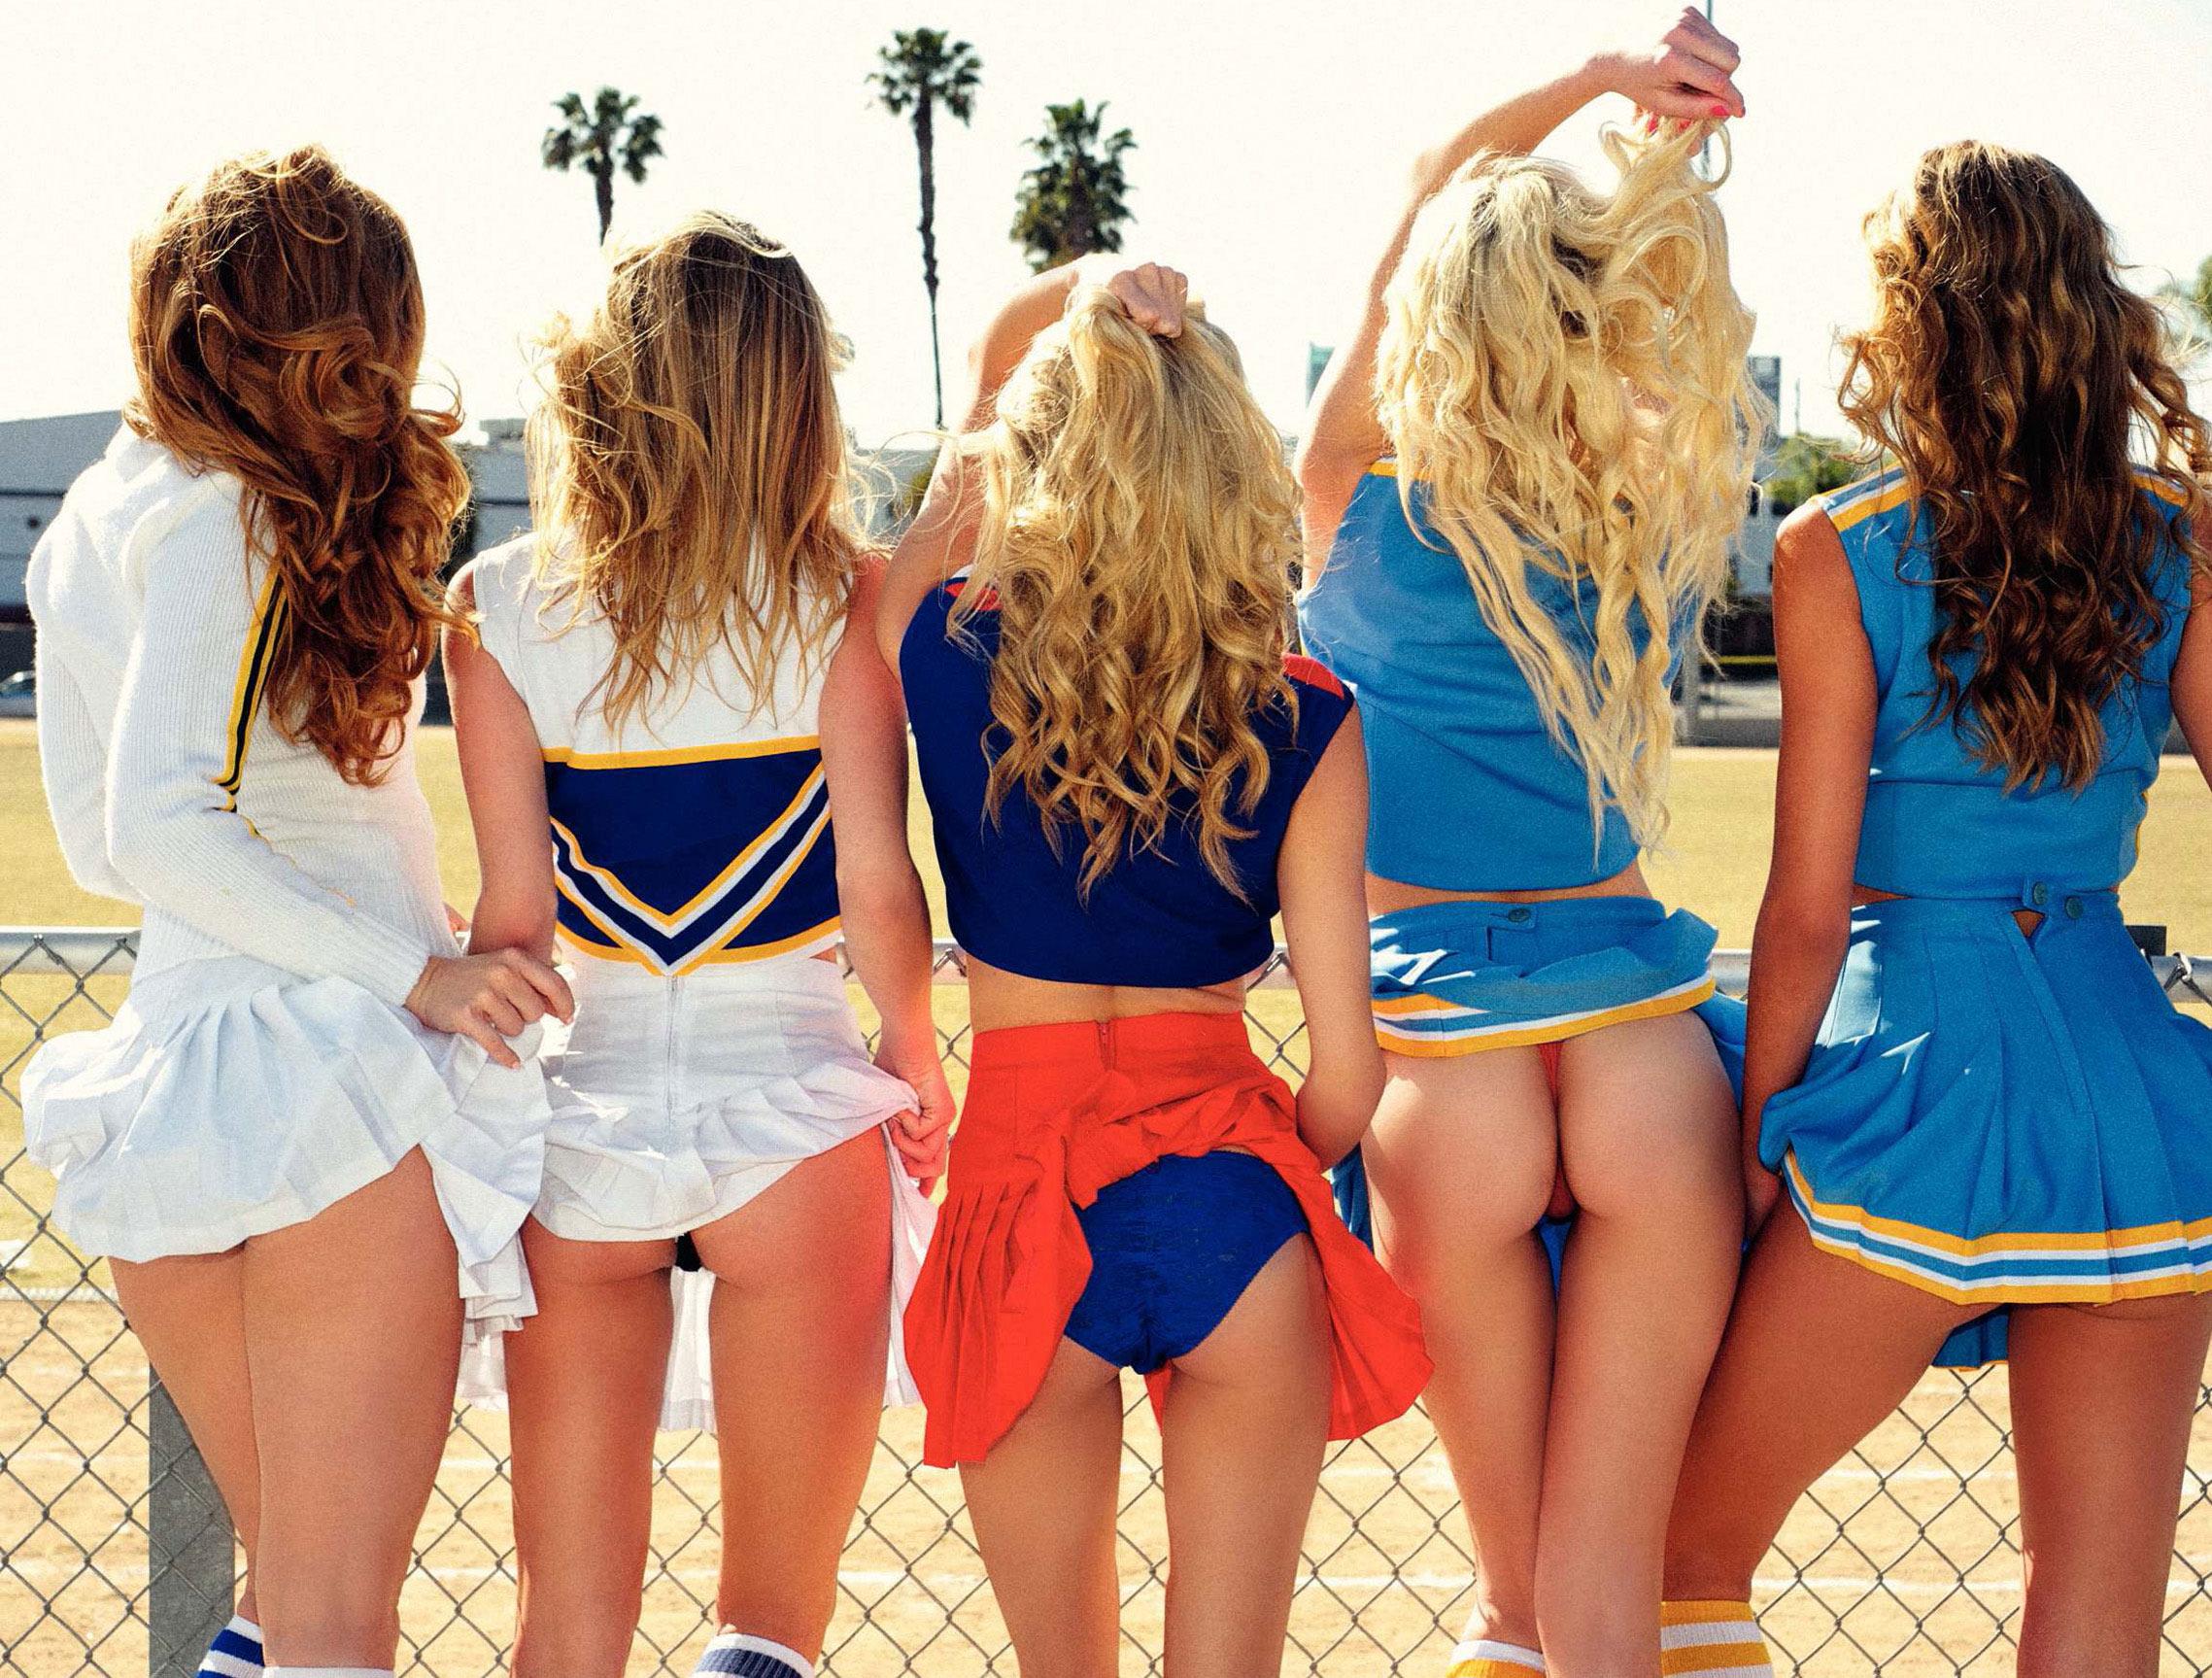 Cheerleaders / плохие девчонки из групп поддержки